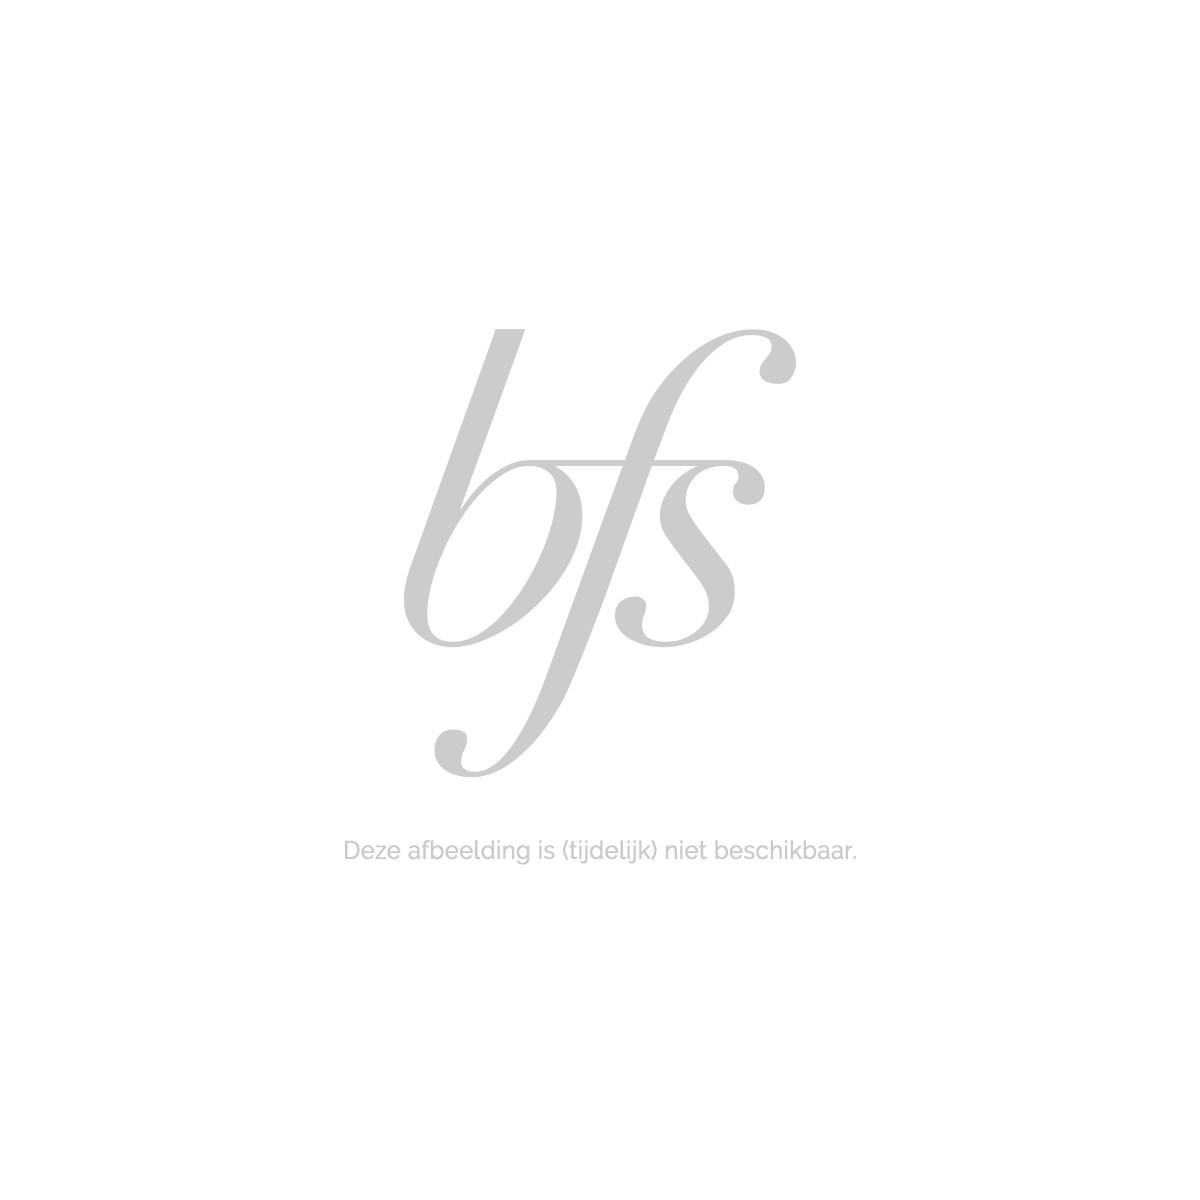 Christian Dior Capture Totale Dreamskin Advanced Cream 50 Ml